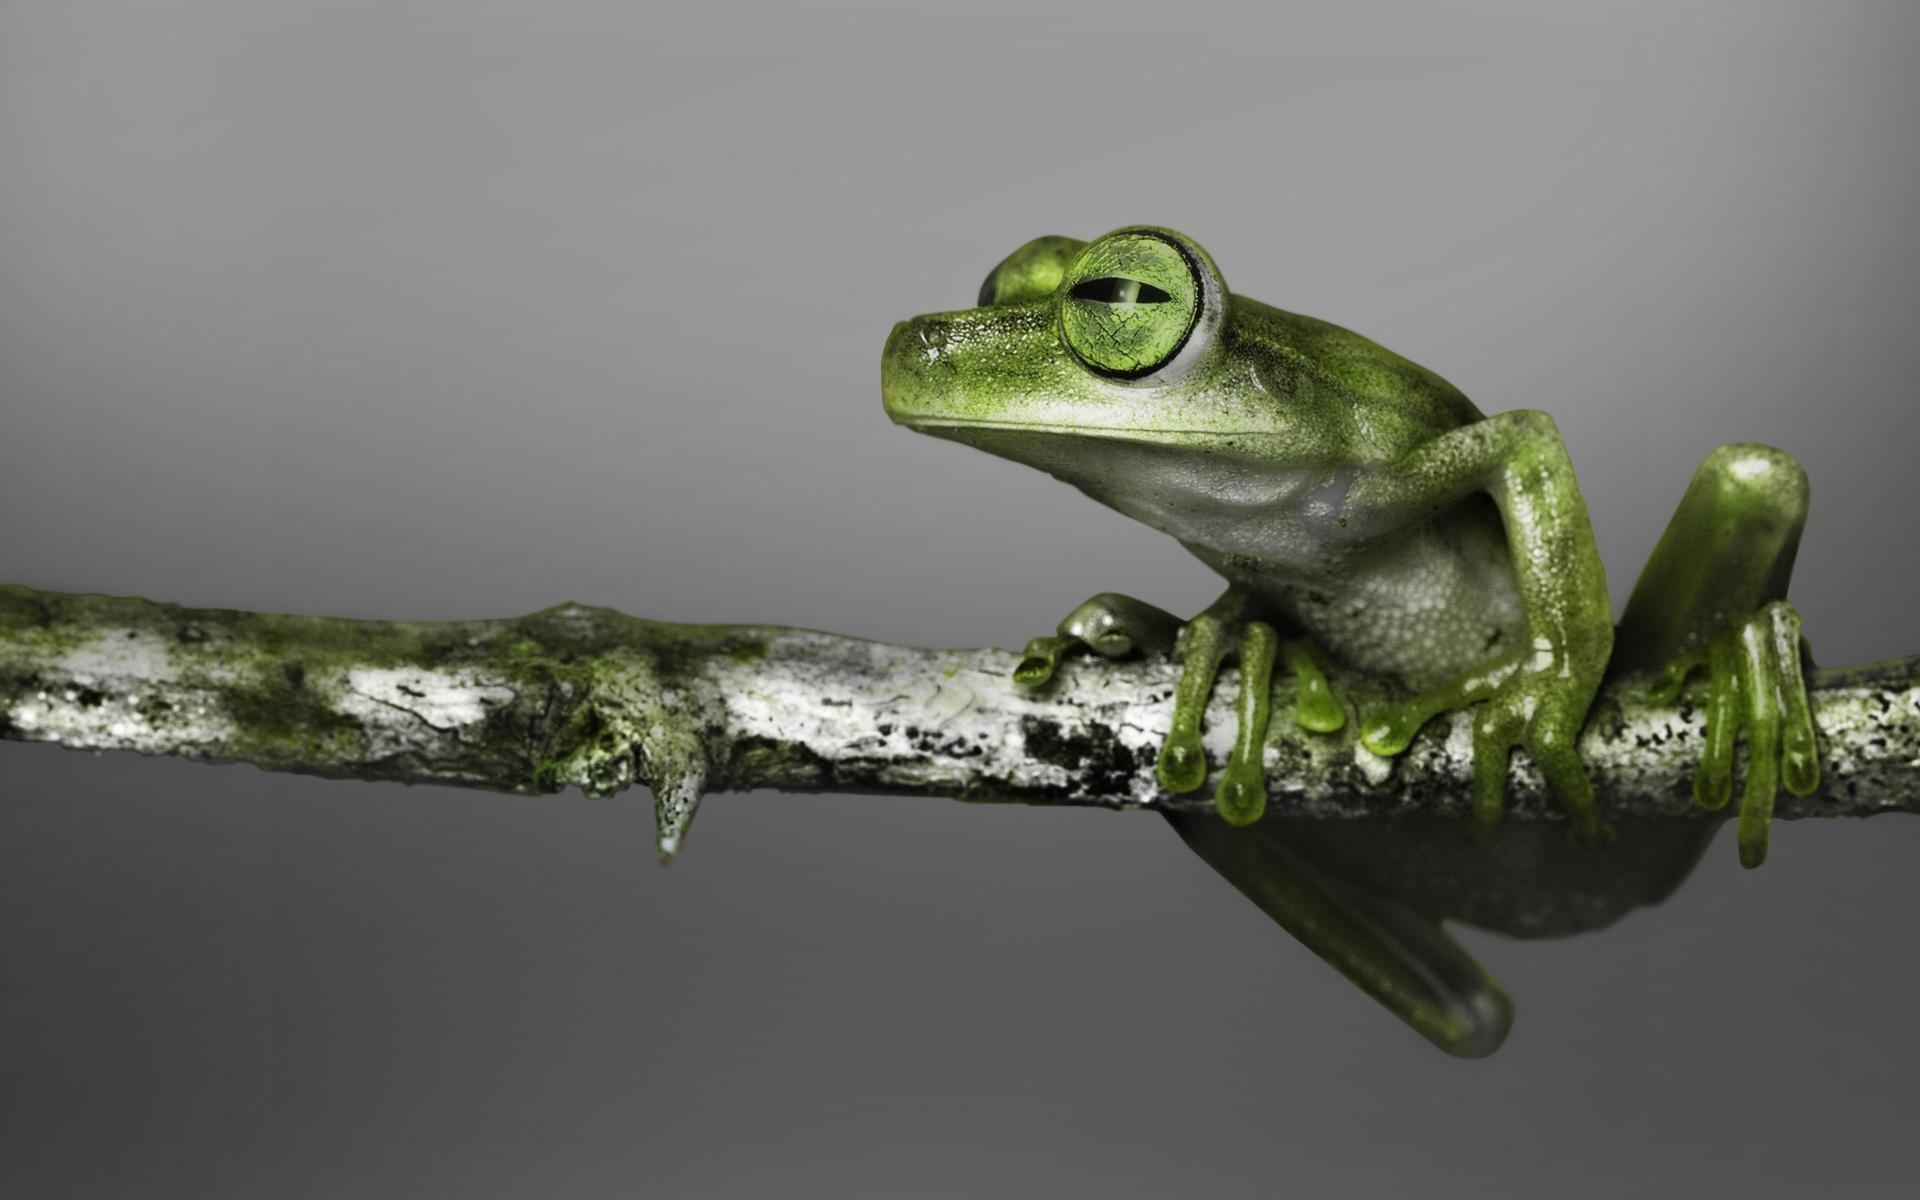 Res: 1920x1200, Green Tree Frog | 1920 x 1200 | Download | Close